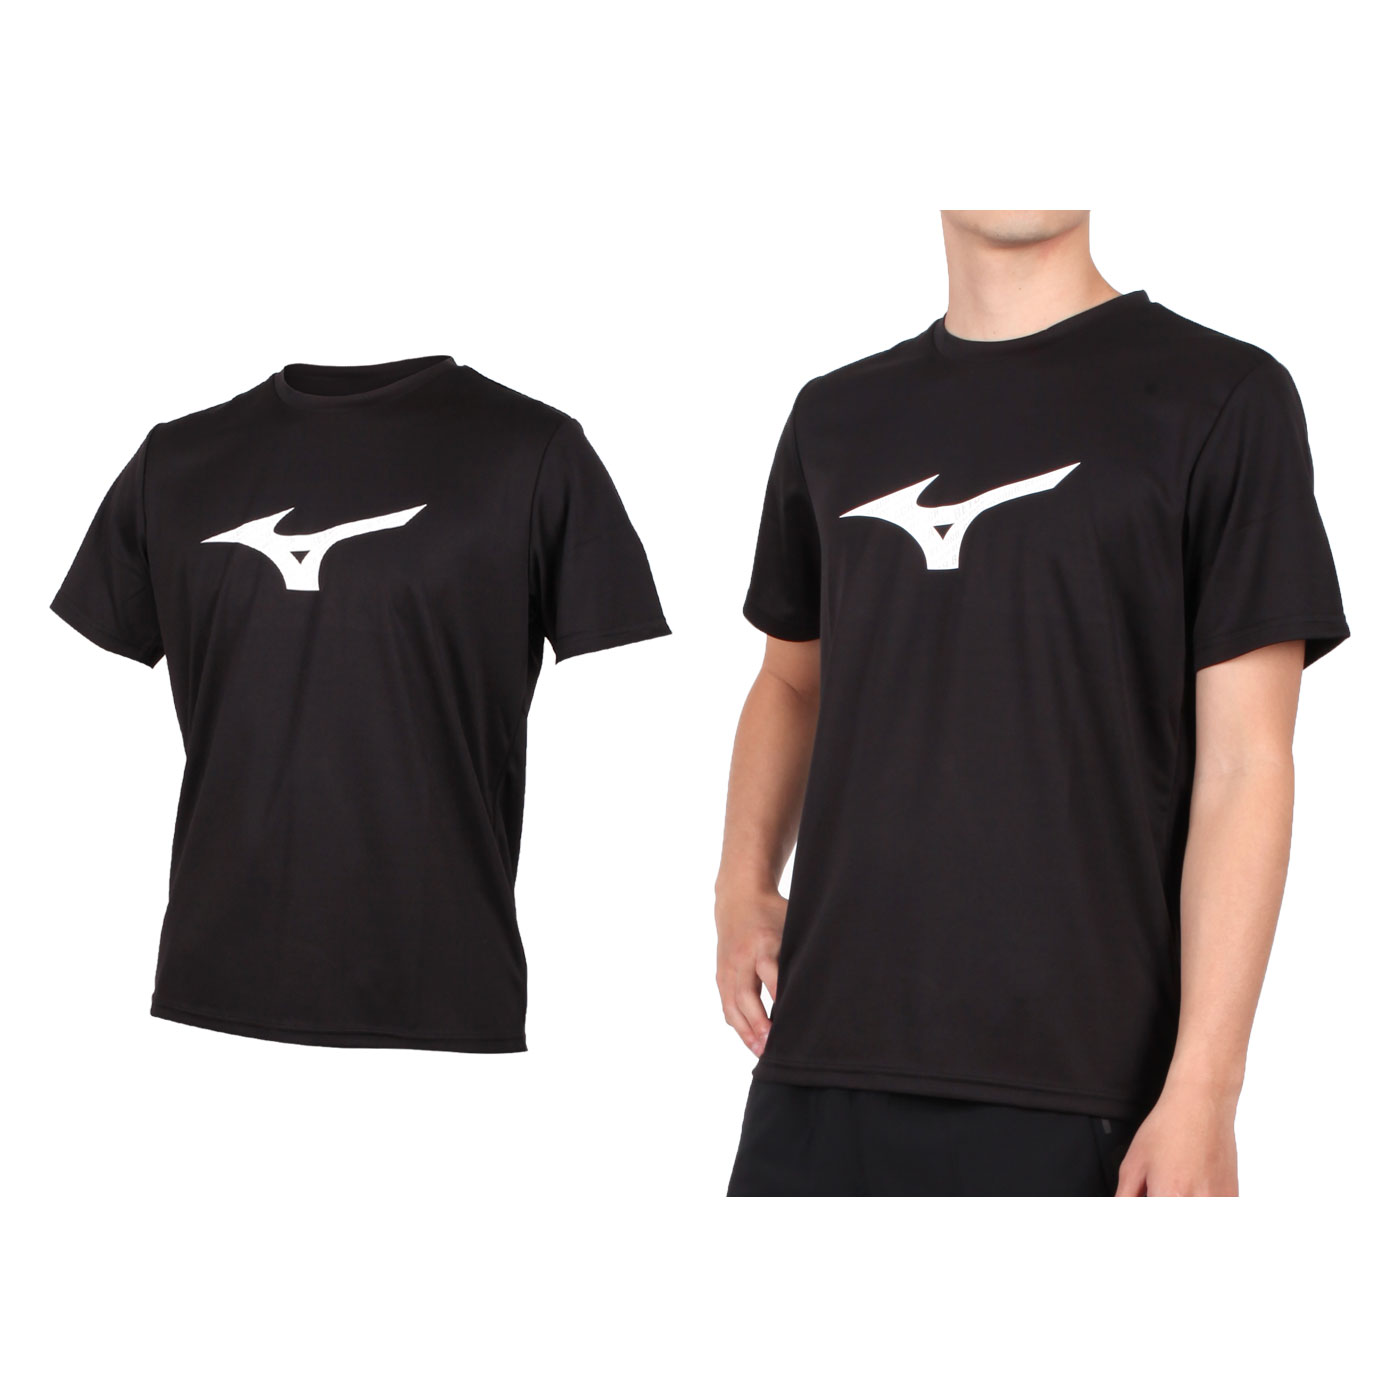 MIZUNO 男款短袖T恤 32TA000109 - 黑白灰